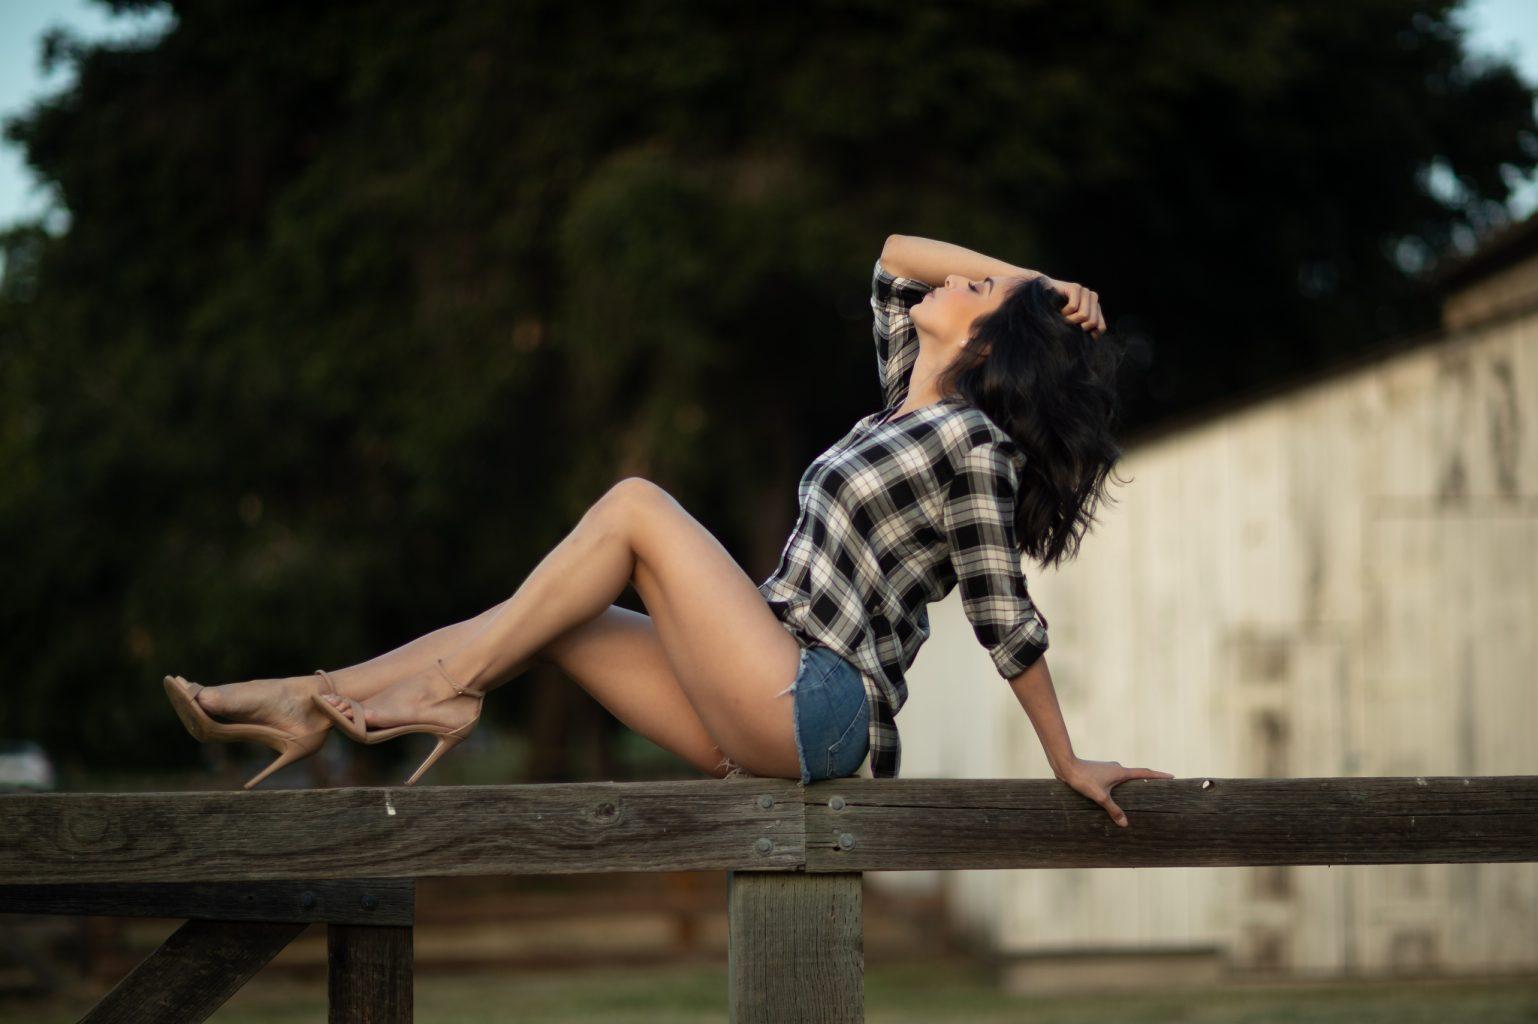 outdoor barn photoshoot